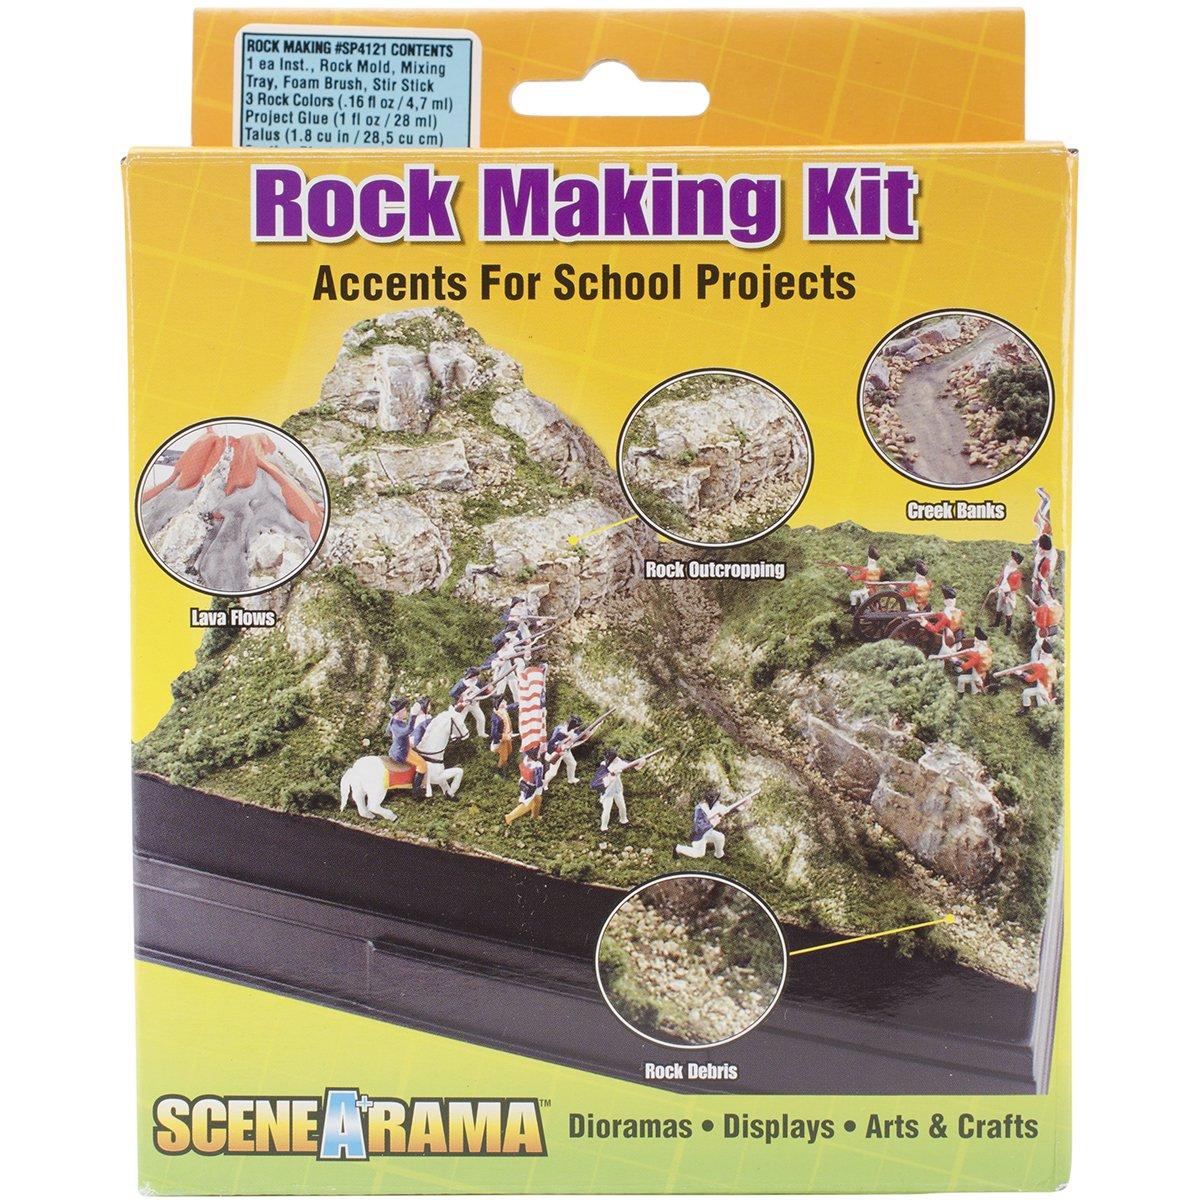 Woodland Scenics Karton Diorama Kit Rock Macht SP4121